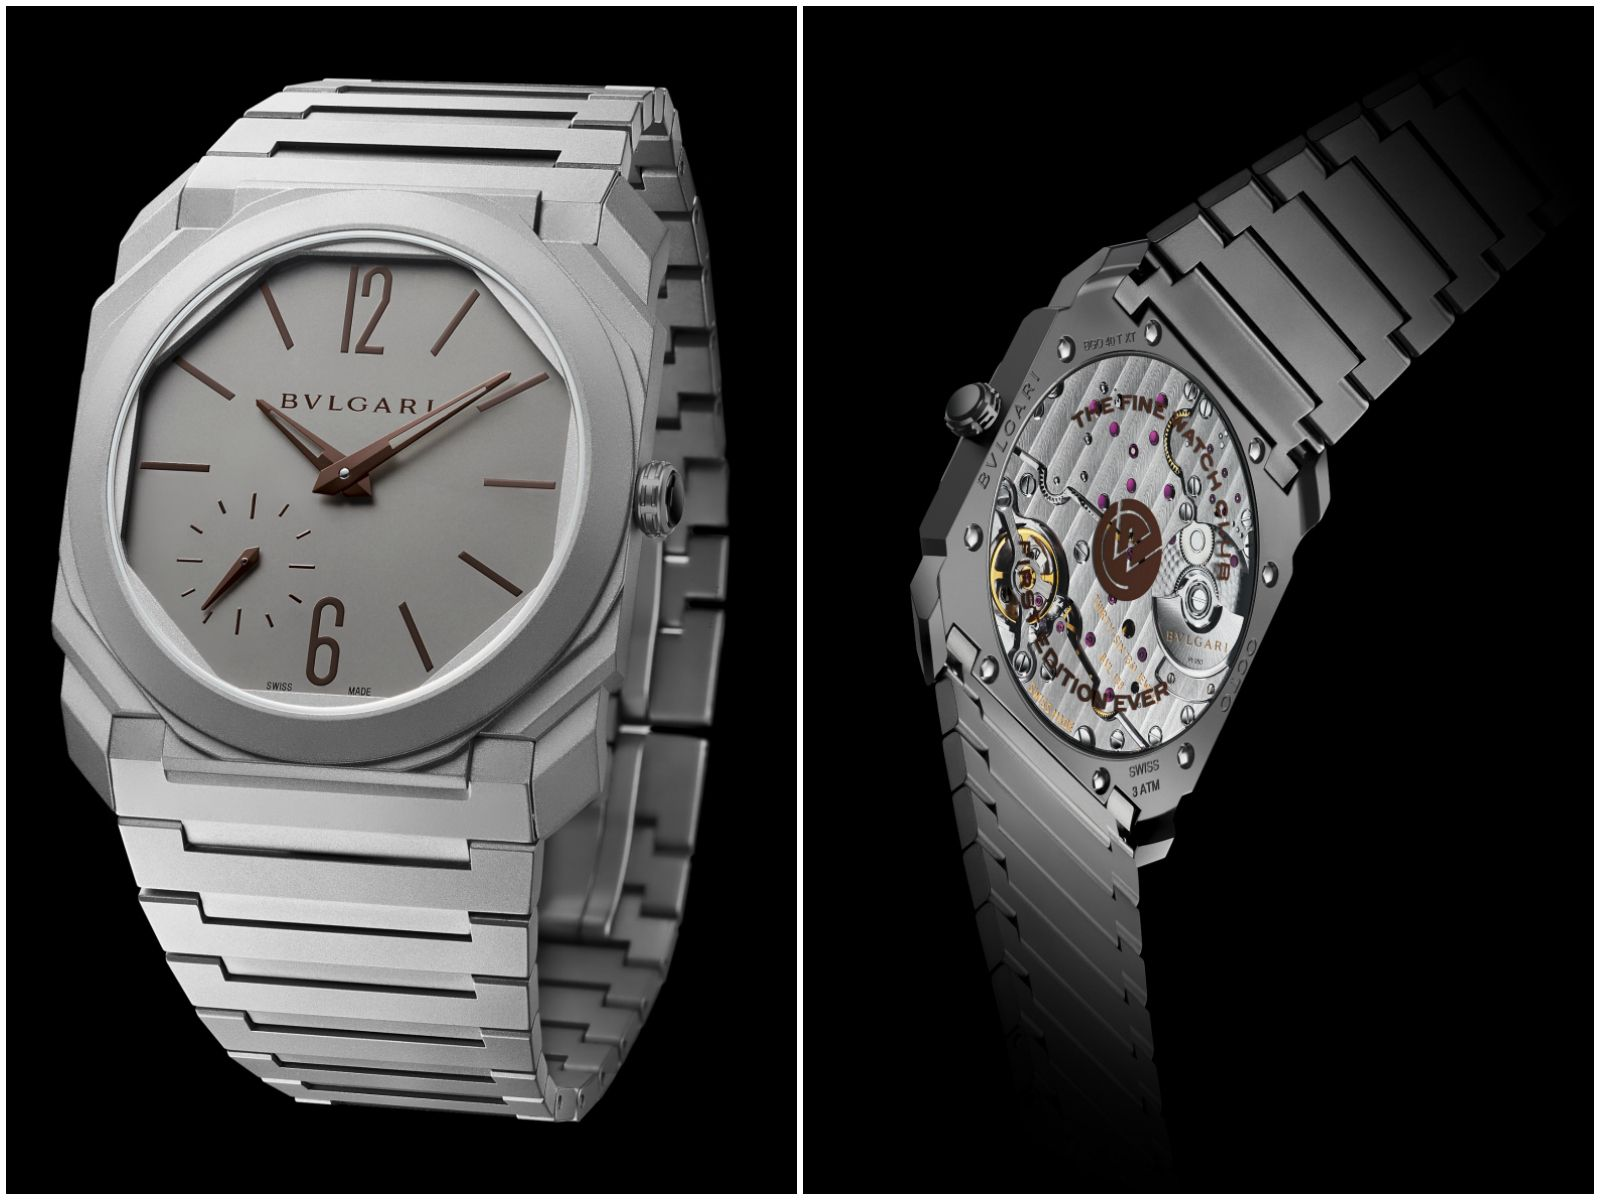 Bulgari Octo Finissimo in titanium, exclusive to the Fine Watch Club